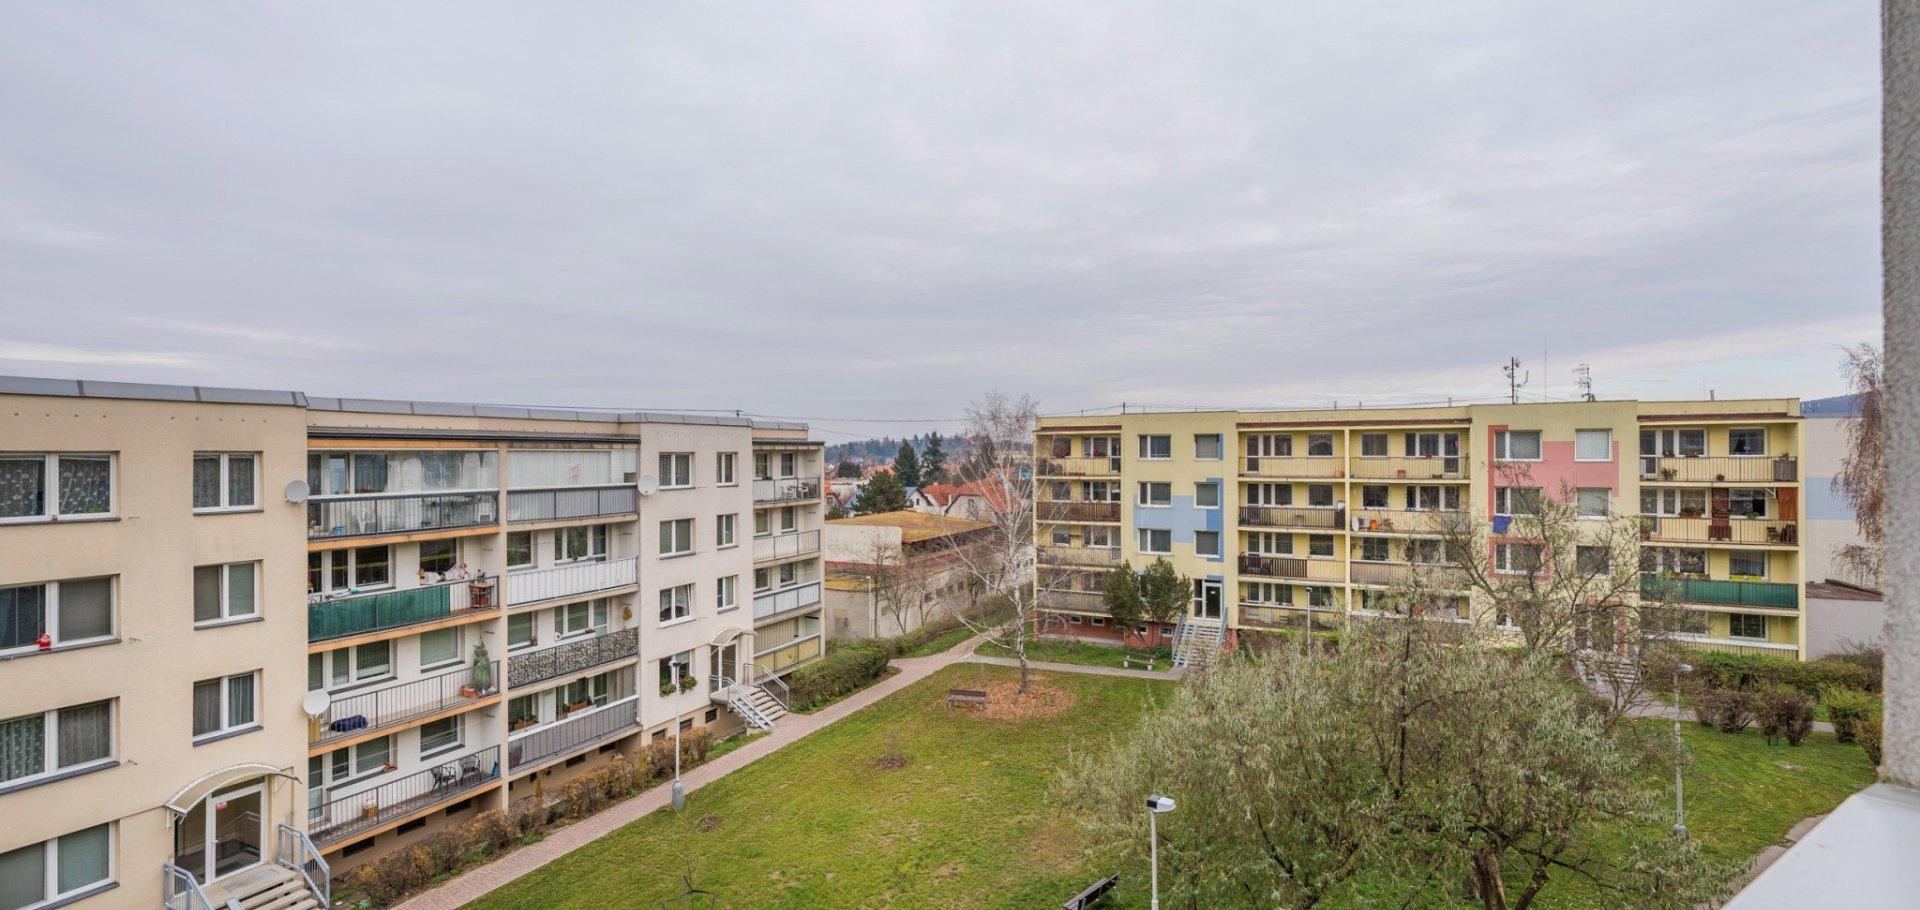 Prodej bytu 3+1 s lodžií, 81m², Praha - Zbraslav